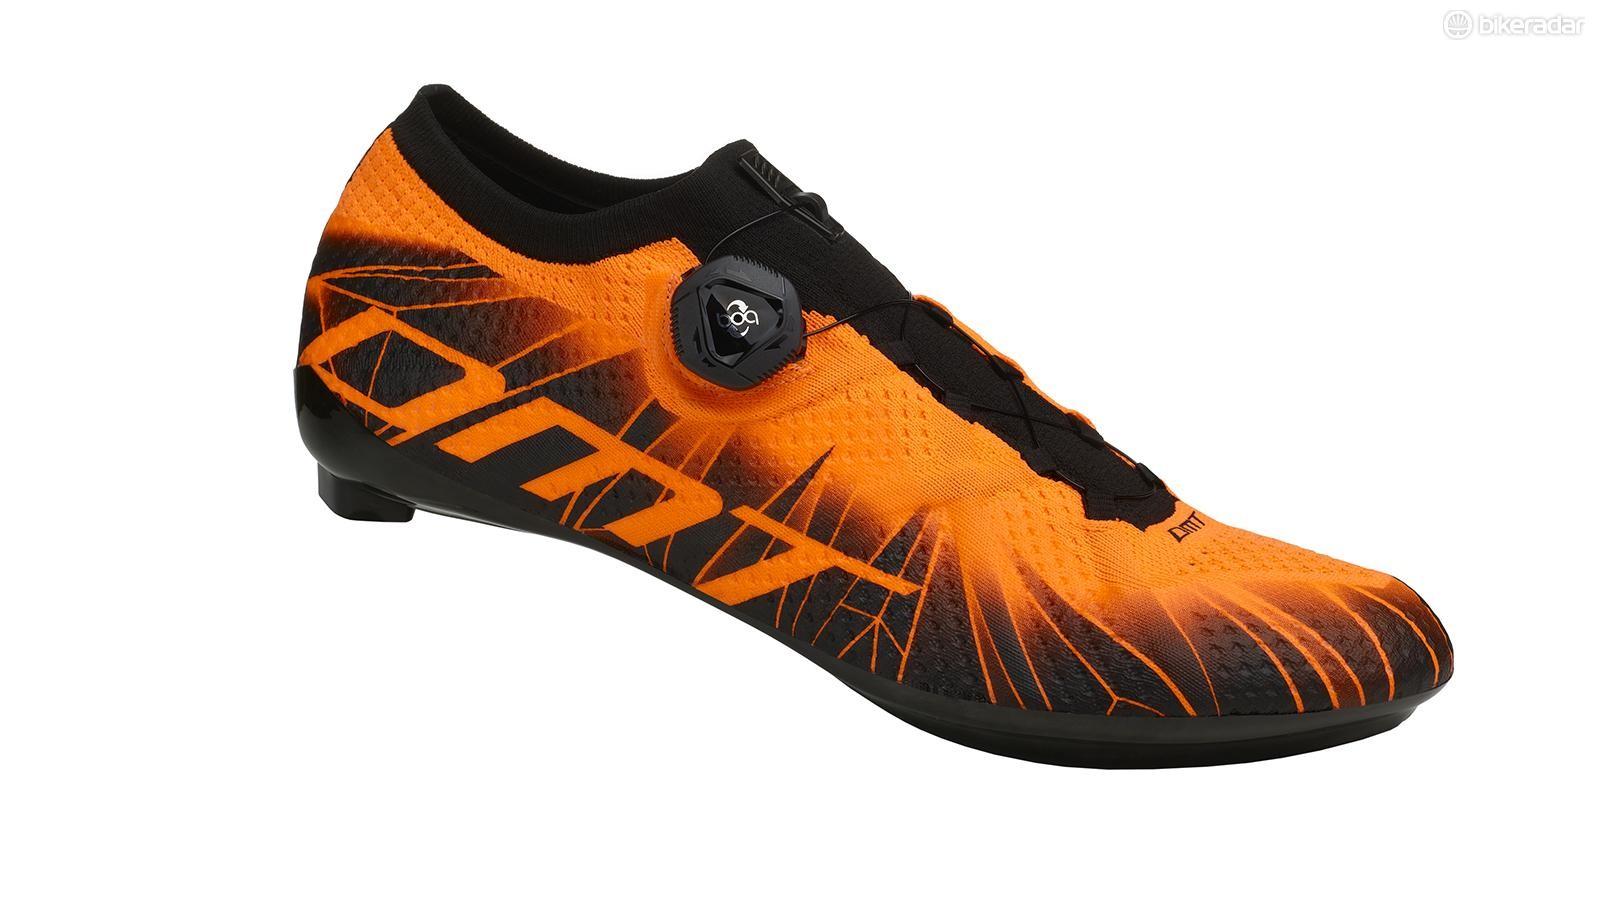 dmt-kr1-orange-1538574907109-1m2ig4g0rrhpc-56001f0